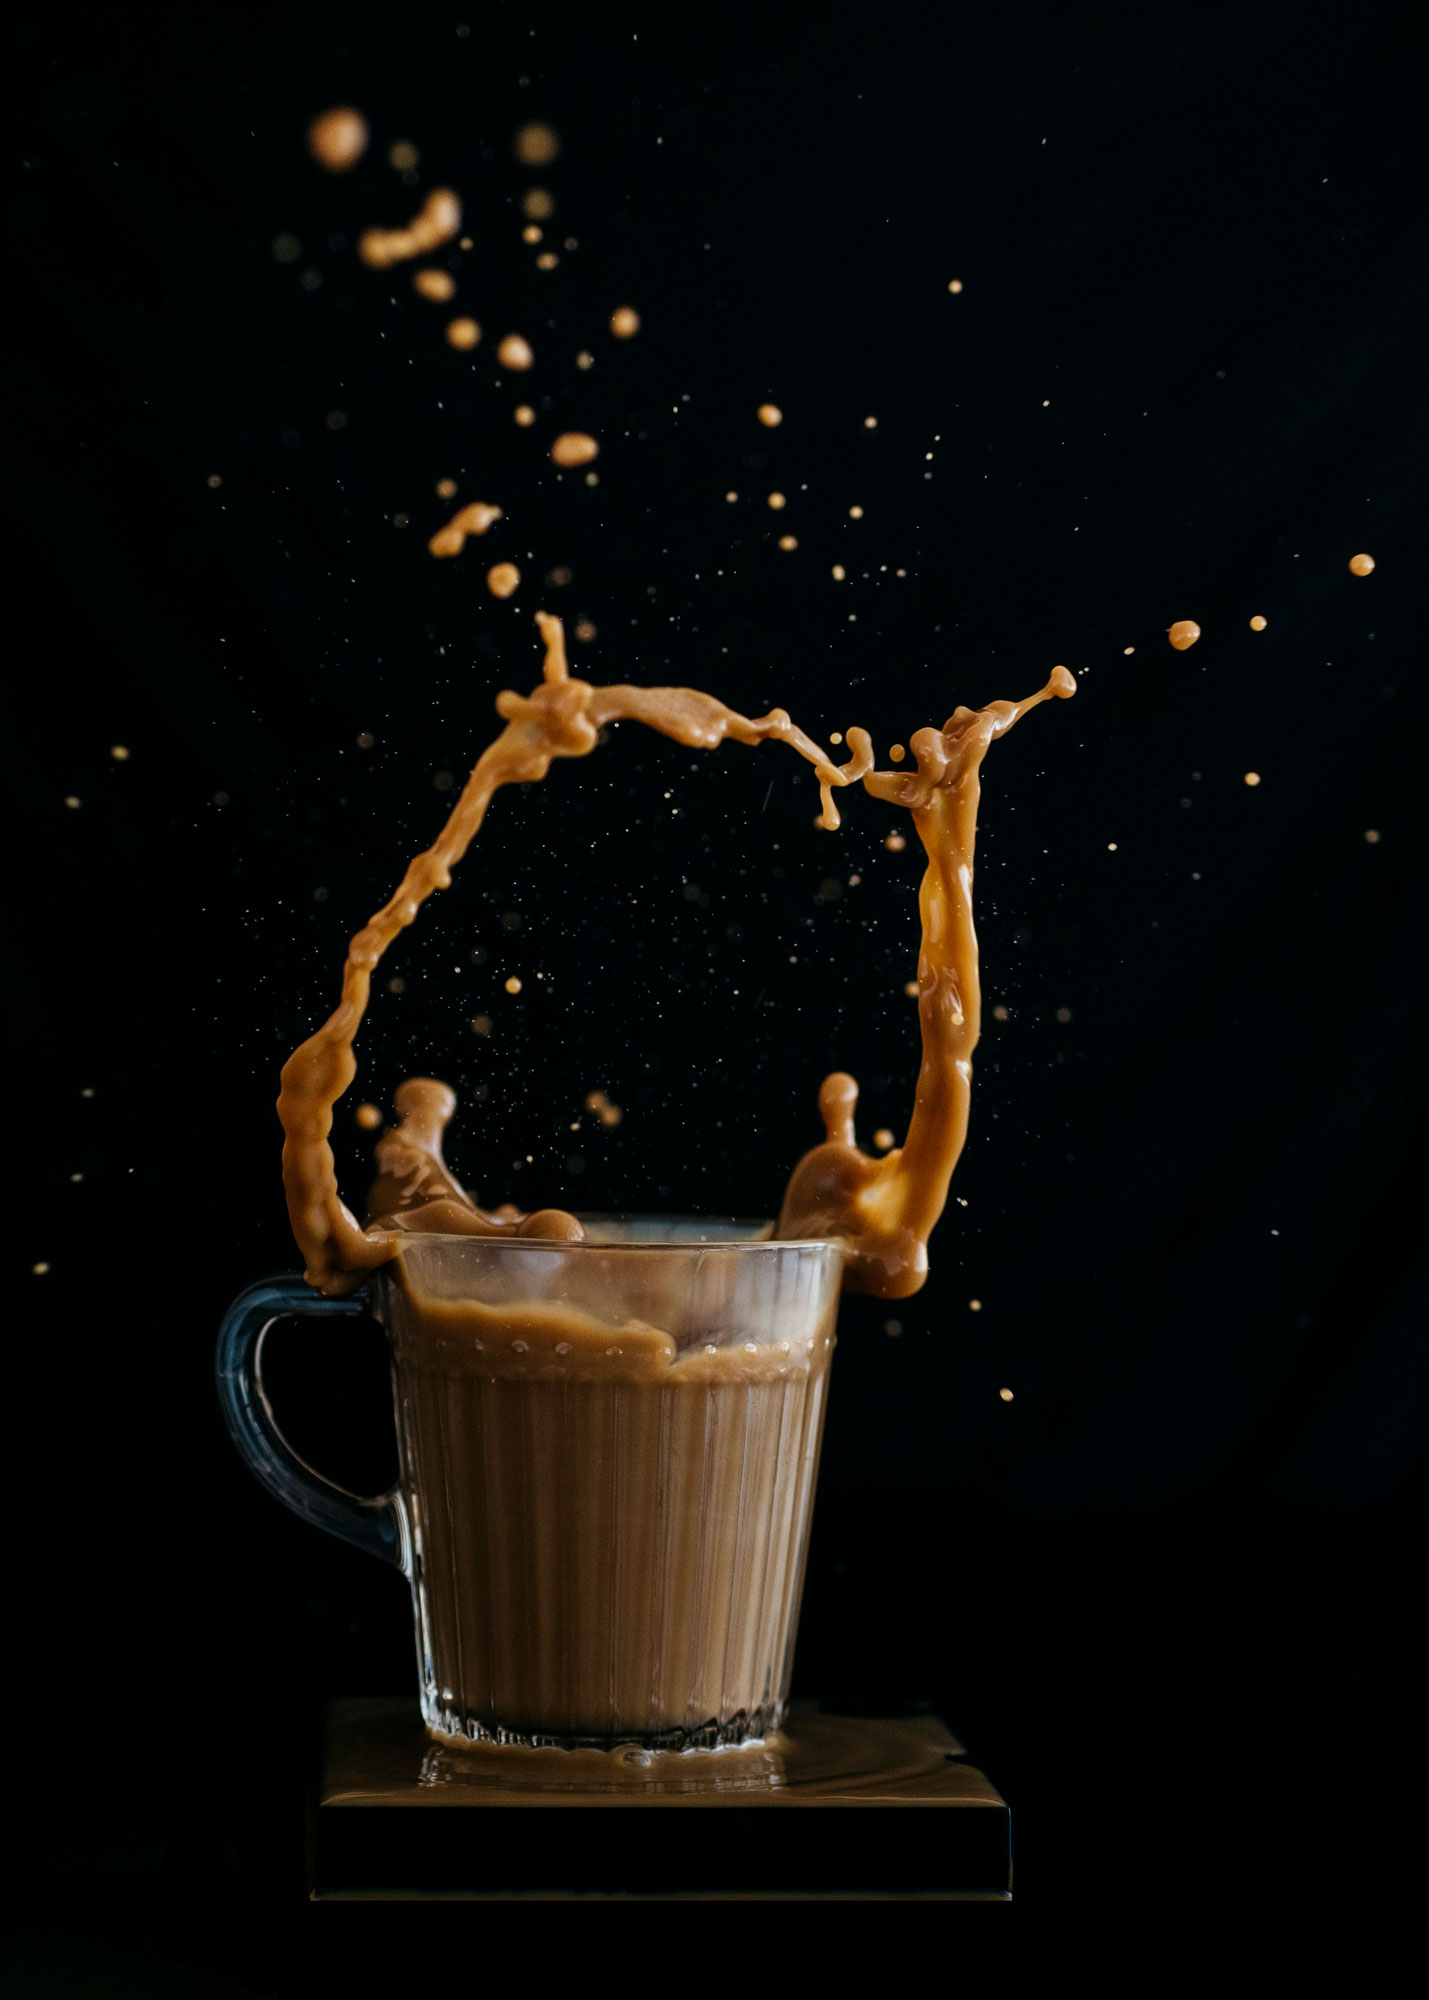 Coffee_splash_Rebecca_Peloquin_Los_Angeles_Beverage_Photographer_006.JPG